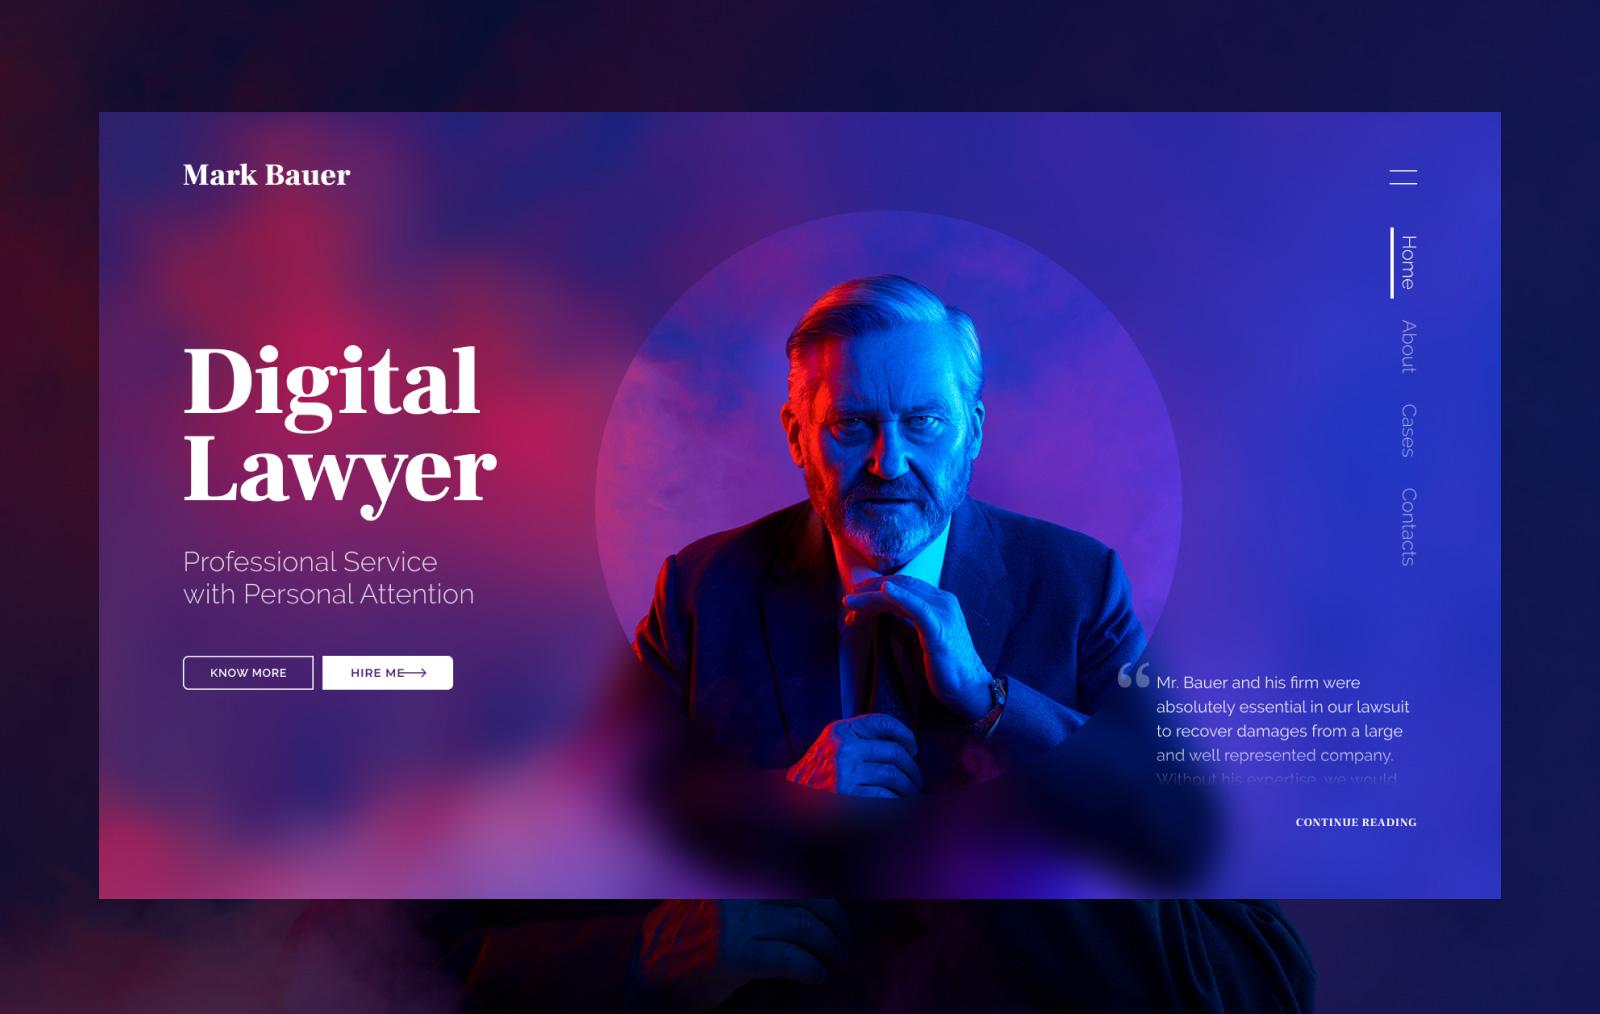 creative marketing strategiesr law firms